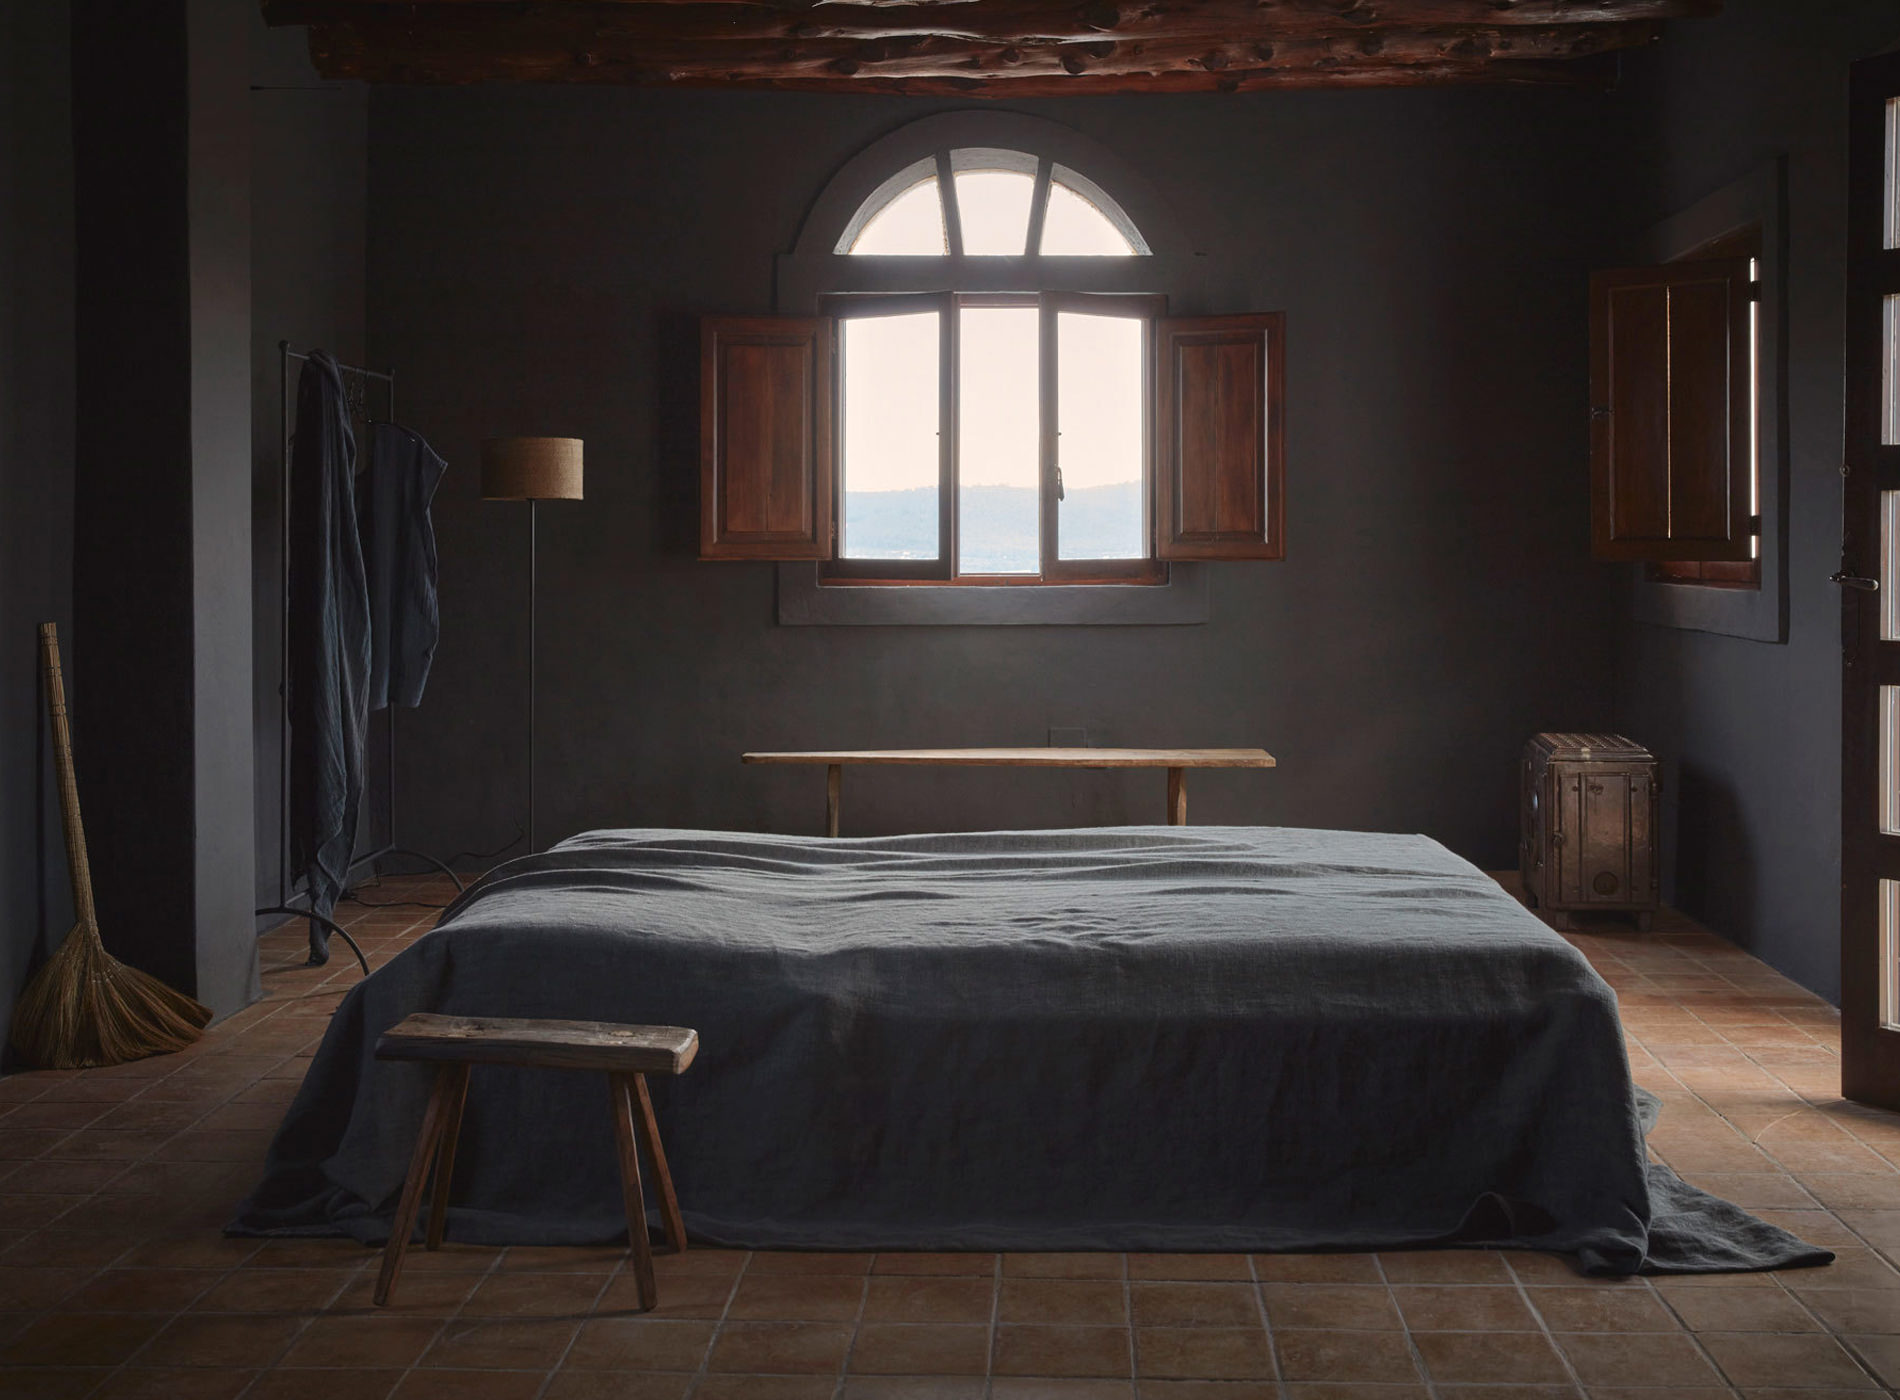 La Granja Ibiza Hotel Design Hotels Espagne Intérieur Chambre